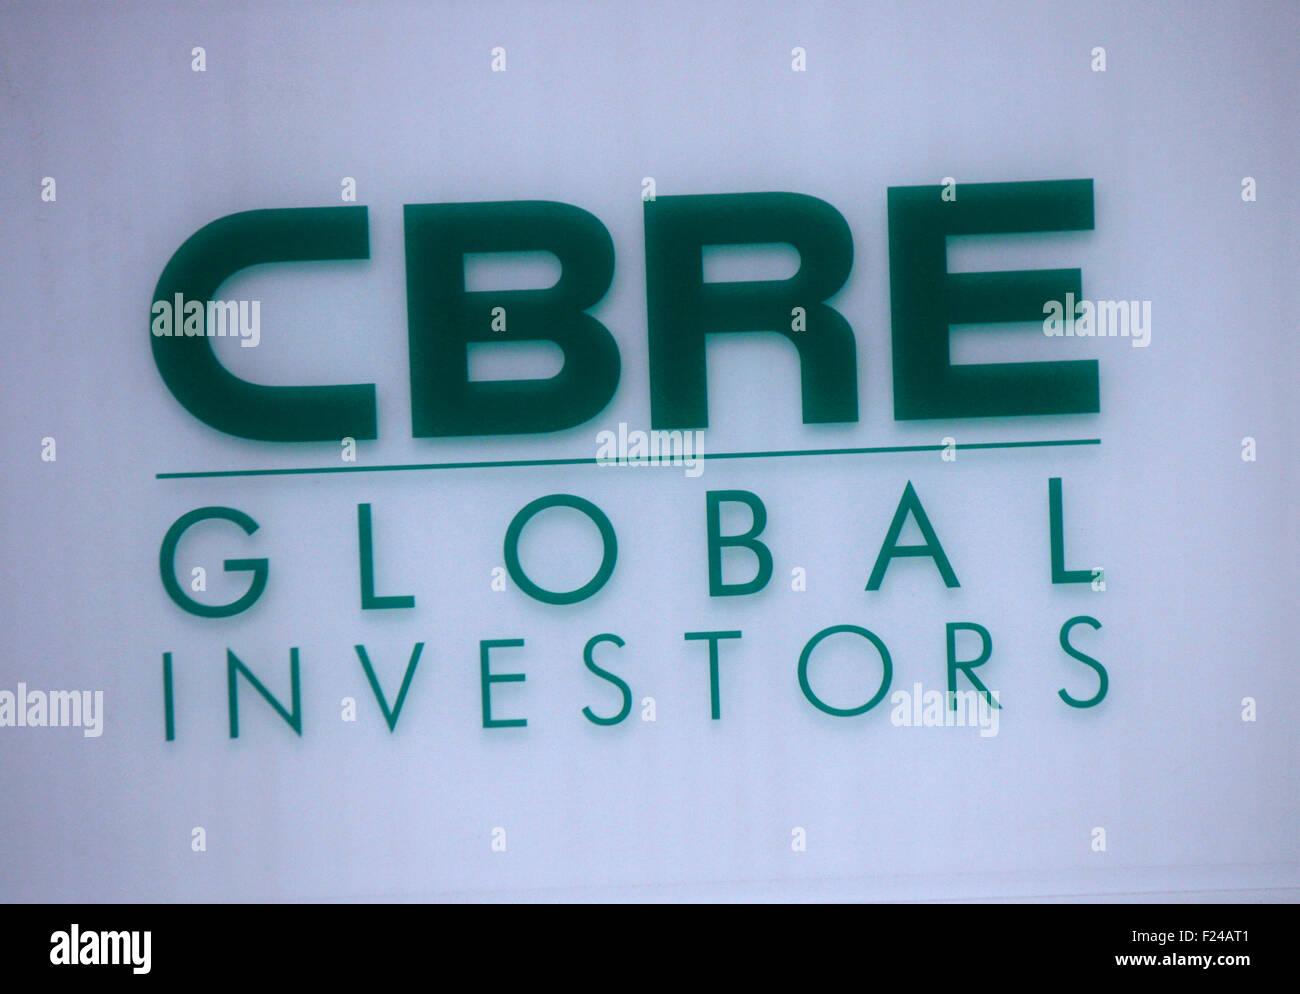 Markenname: 'CBRE Global Investors', Frankfurt am Main. - Stock Image